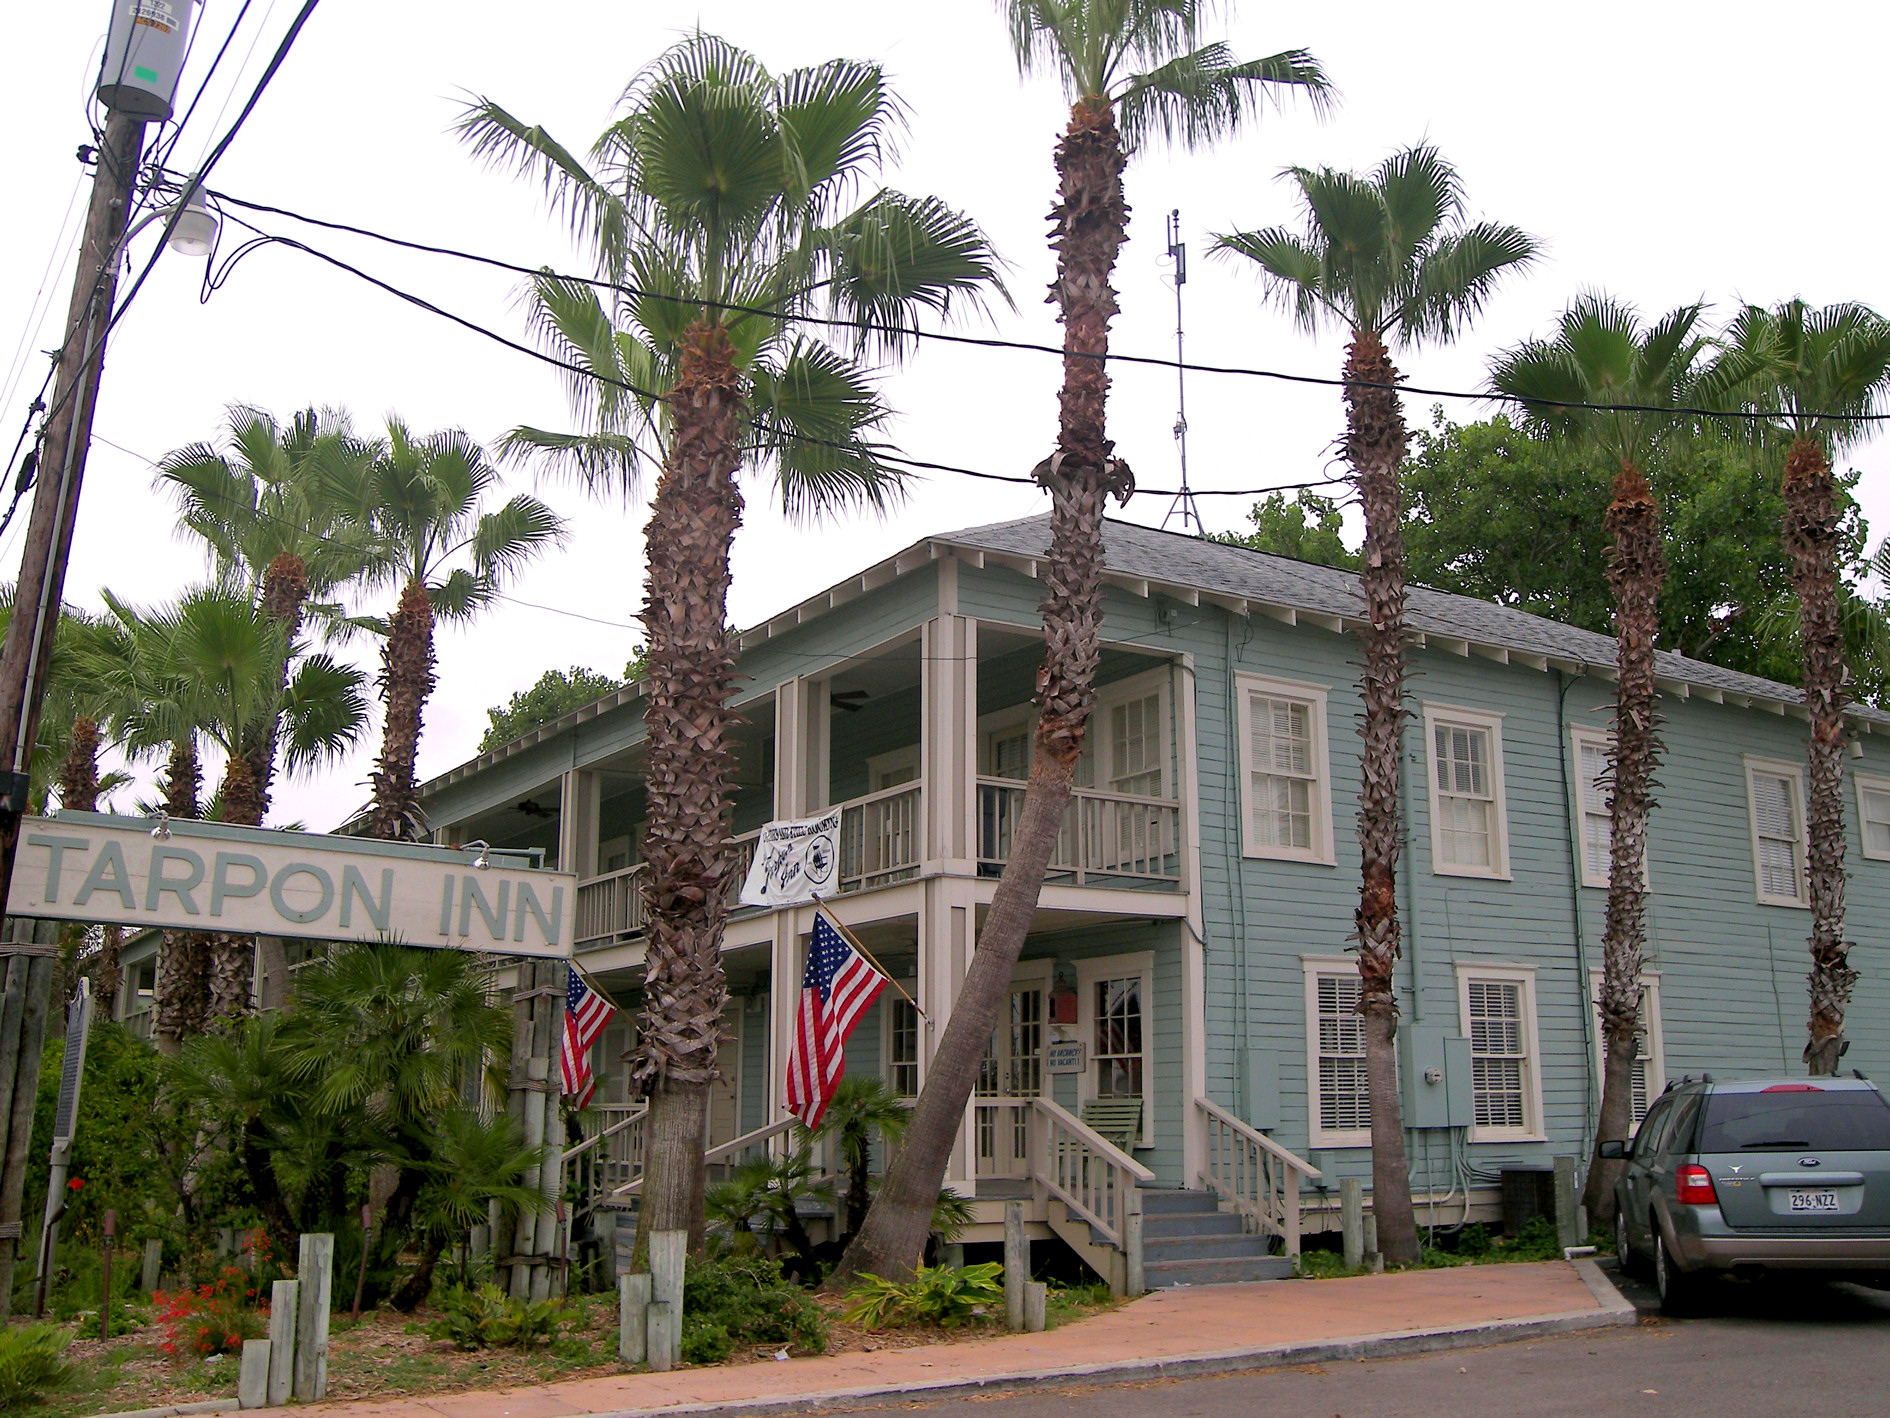 Restaurant Tarpon Inn